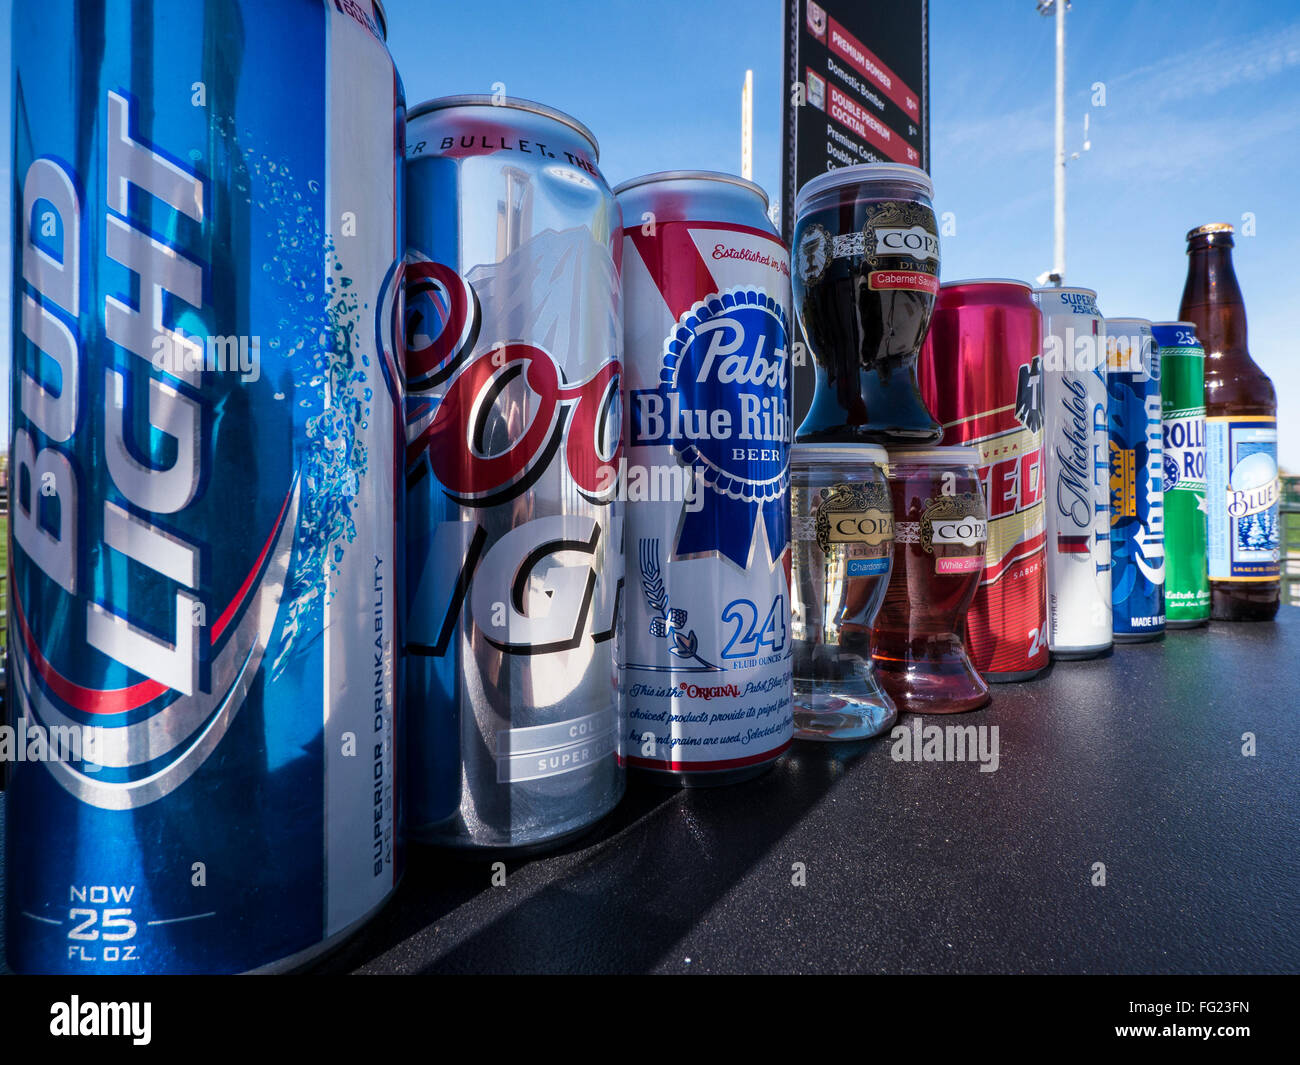 Beers at spring training baseball game, Surprise Stadium, Surprise Recreational Campus, Surprise, Arizona. - Stock Image